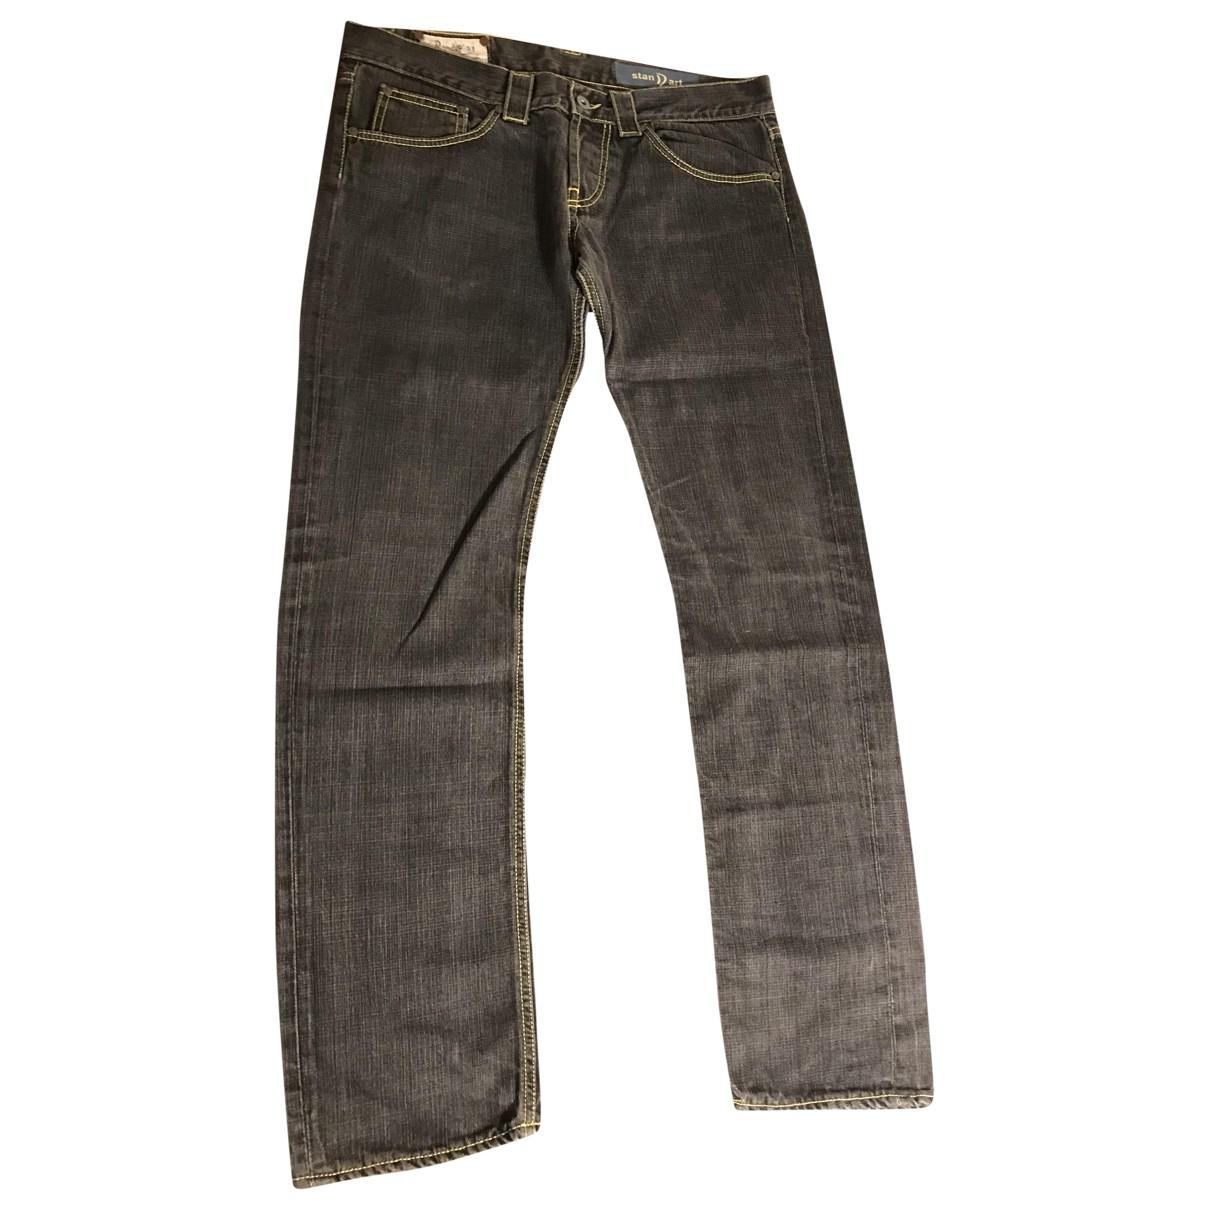 Dondup \N Denim - Jeans Trousers for Women 44 IT